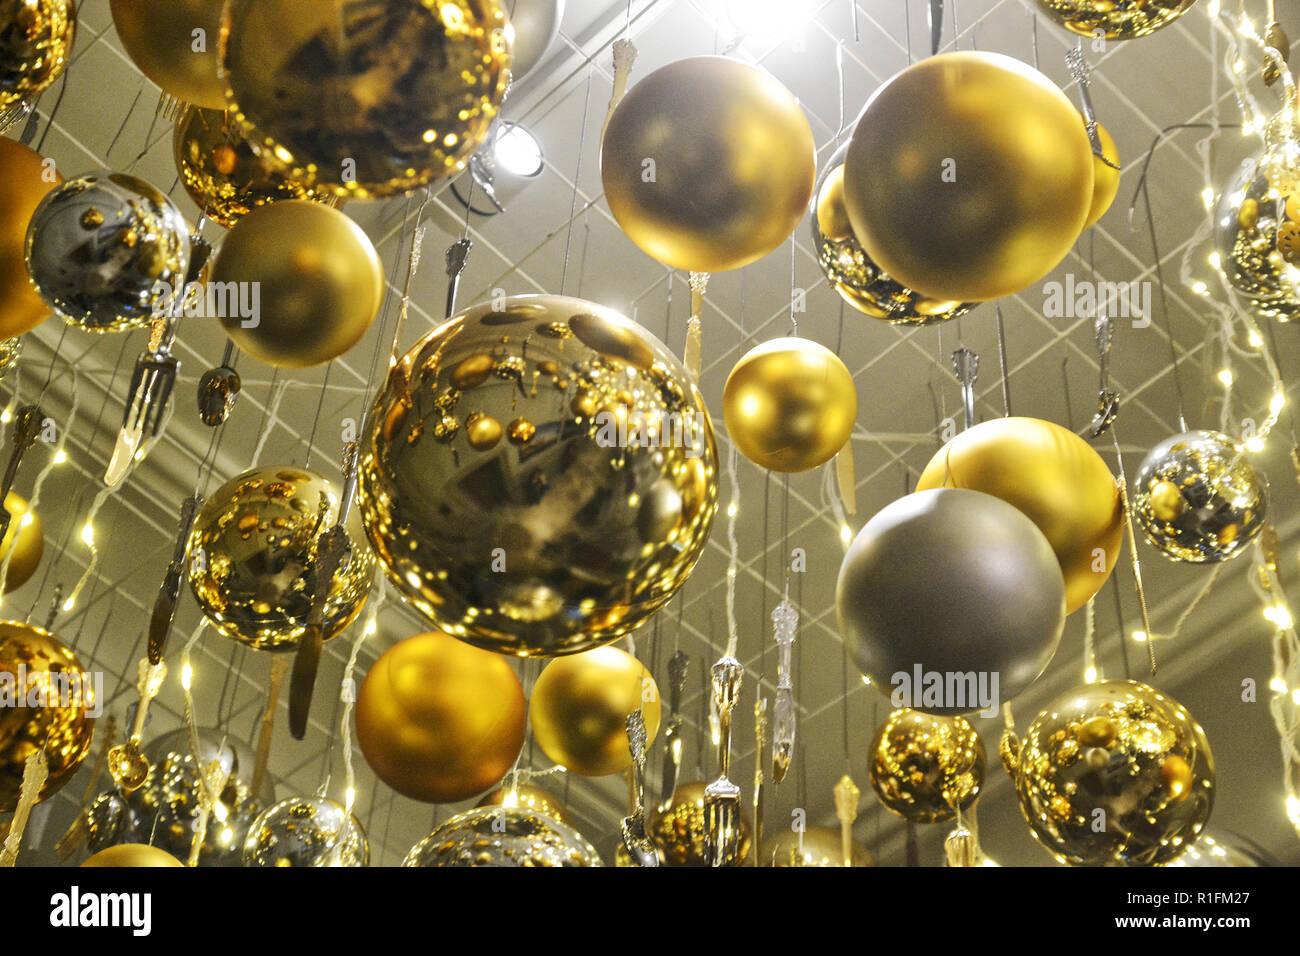 Aylesbury, Buckinghamshire, UK. 11 Nov, 2018. Waddesdon Manor Decorated for Christmas 2018. Christmas Carnival Theme. 10 Nov to 2 January 2019 Credit: Susie Kearley/Alamy Live News - Stock Image